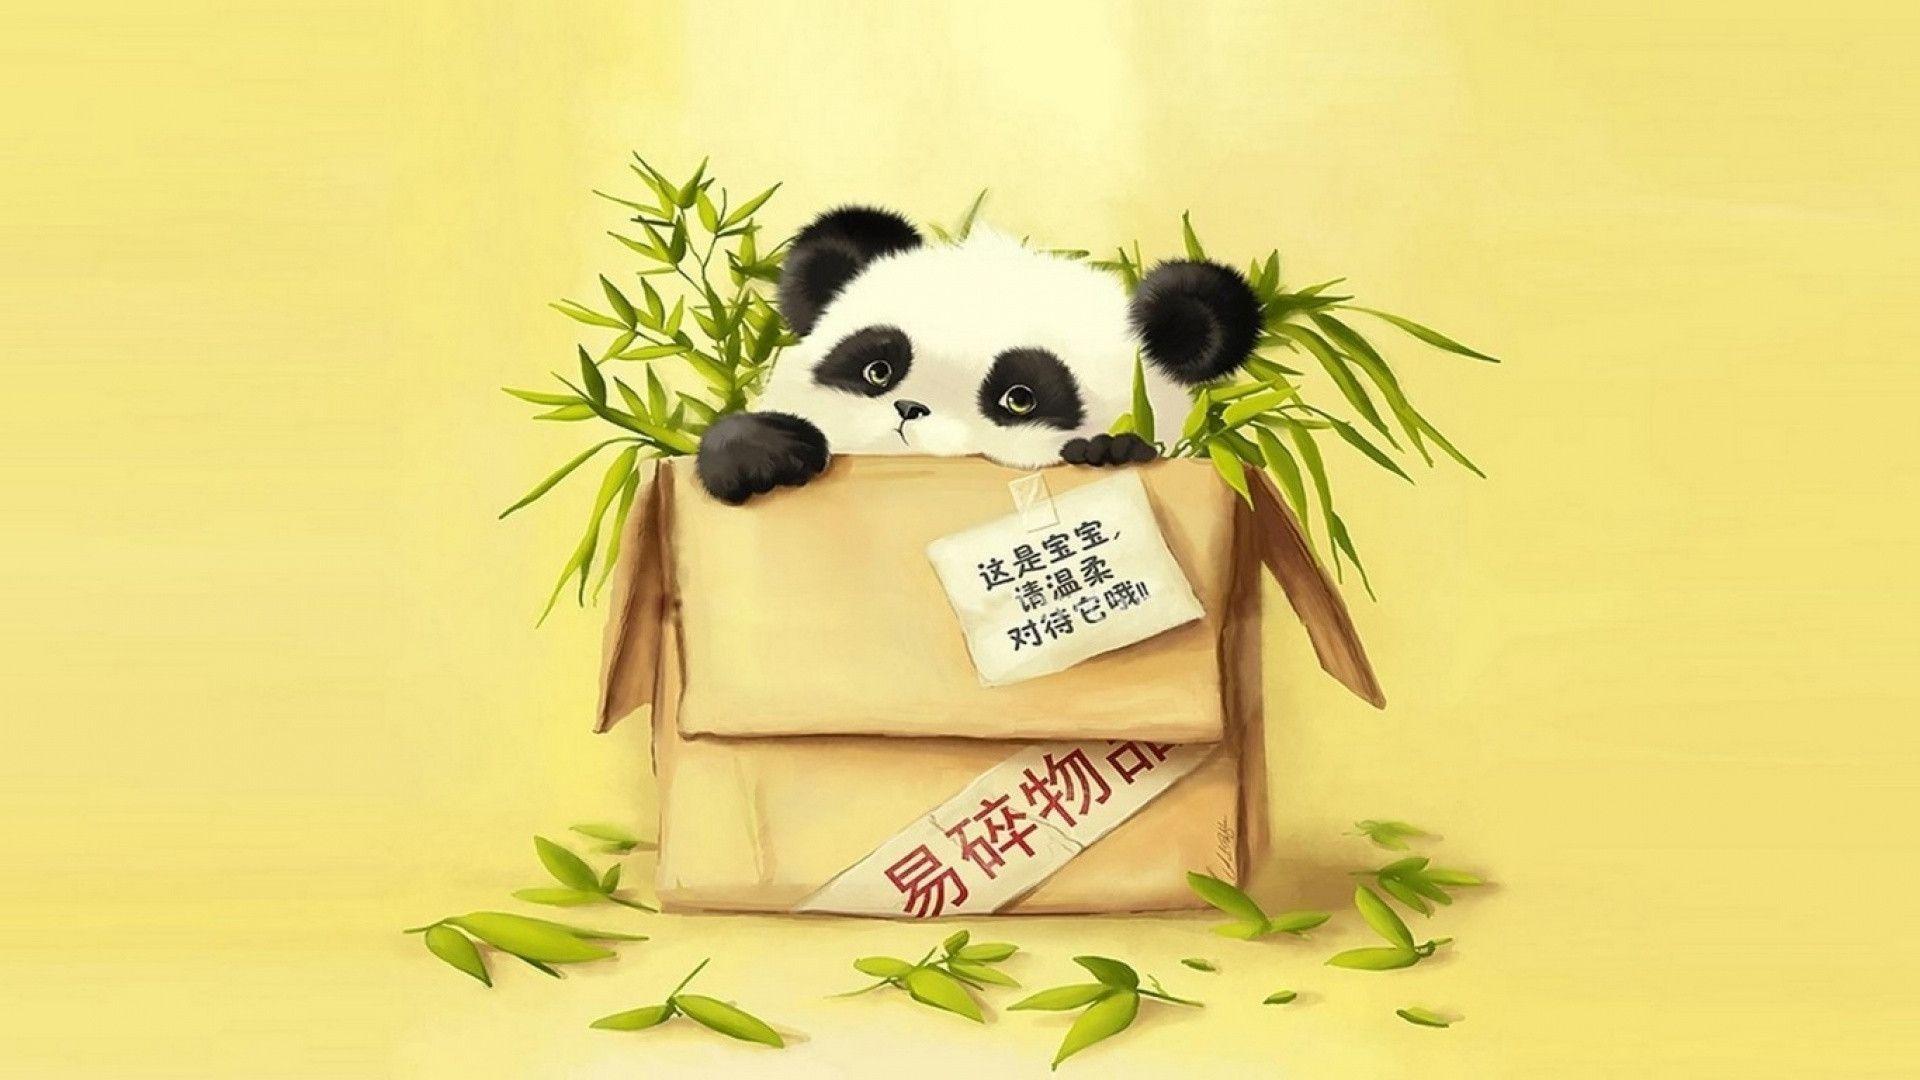 Res: 1920x1080, Funny Cartoon Panda Wallpaper - Cartoon Wallpapers (10007) ilikewalls.